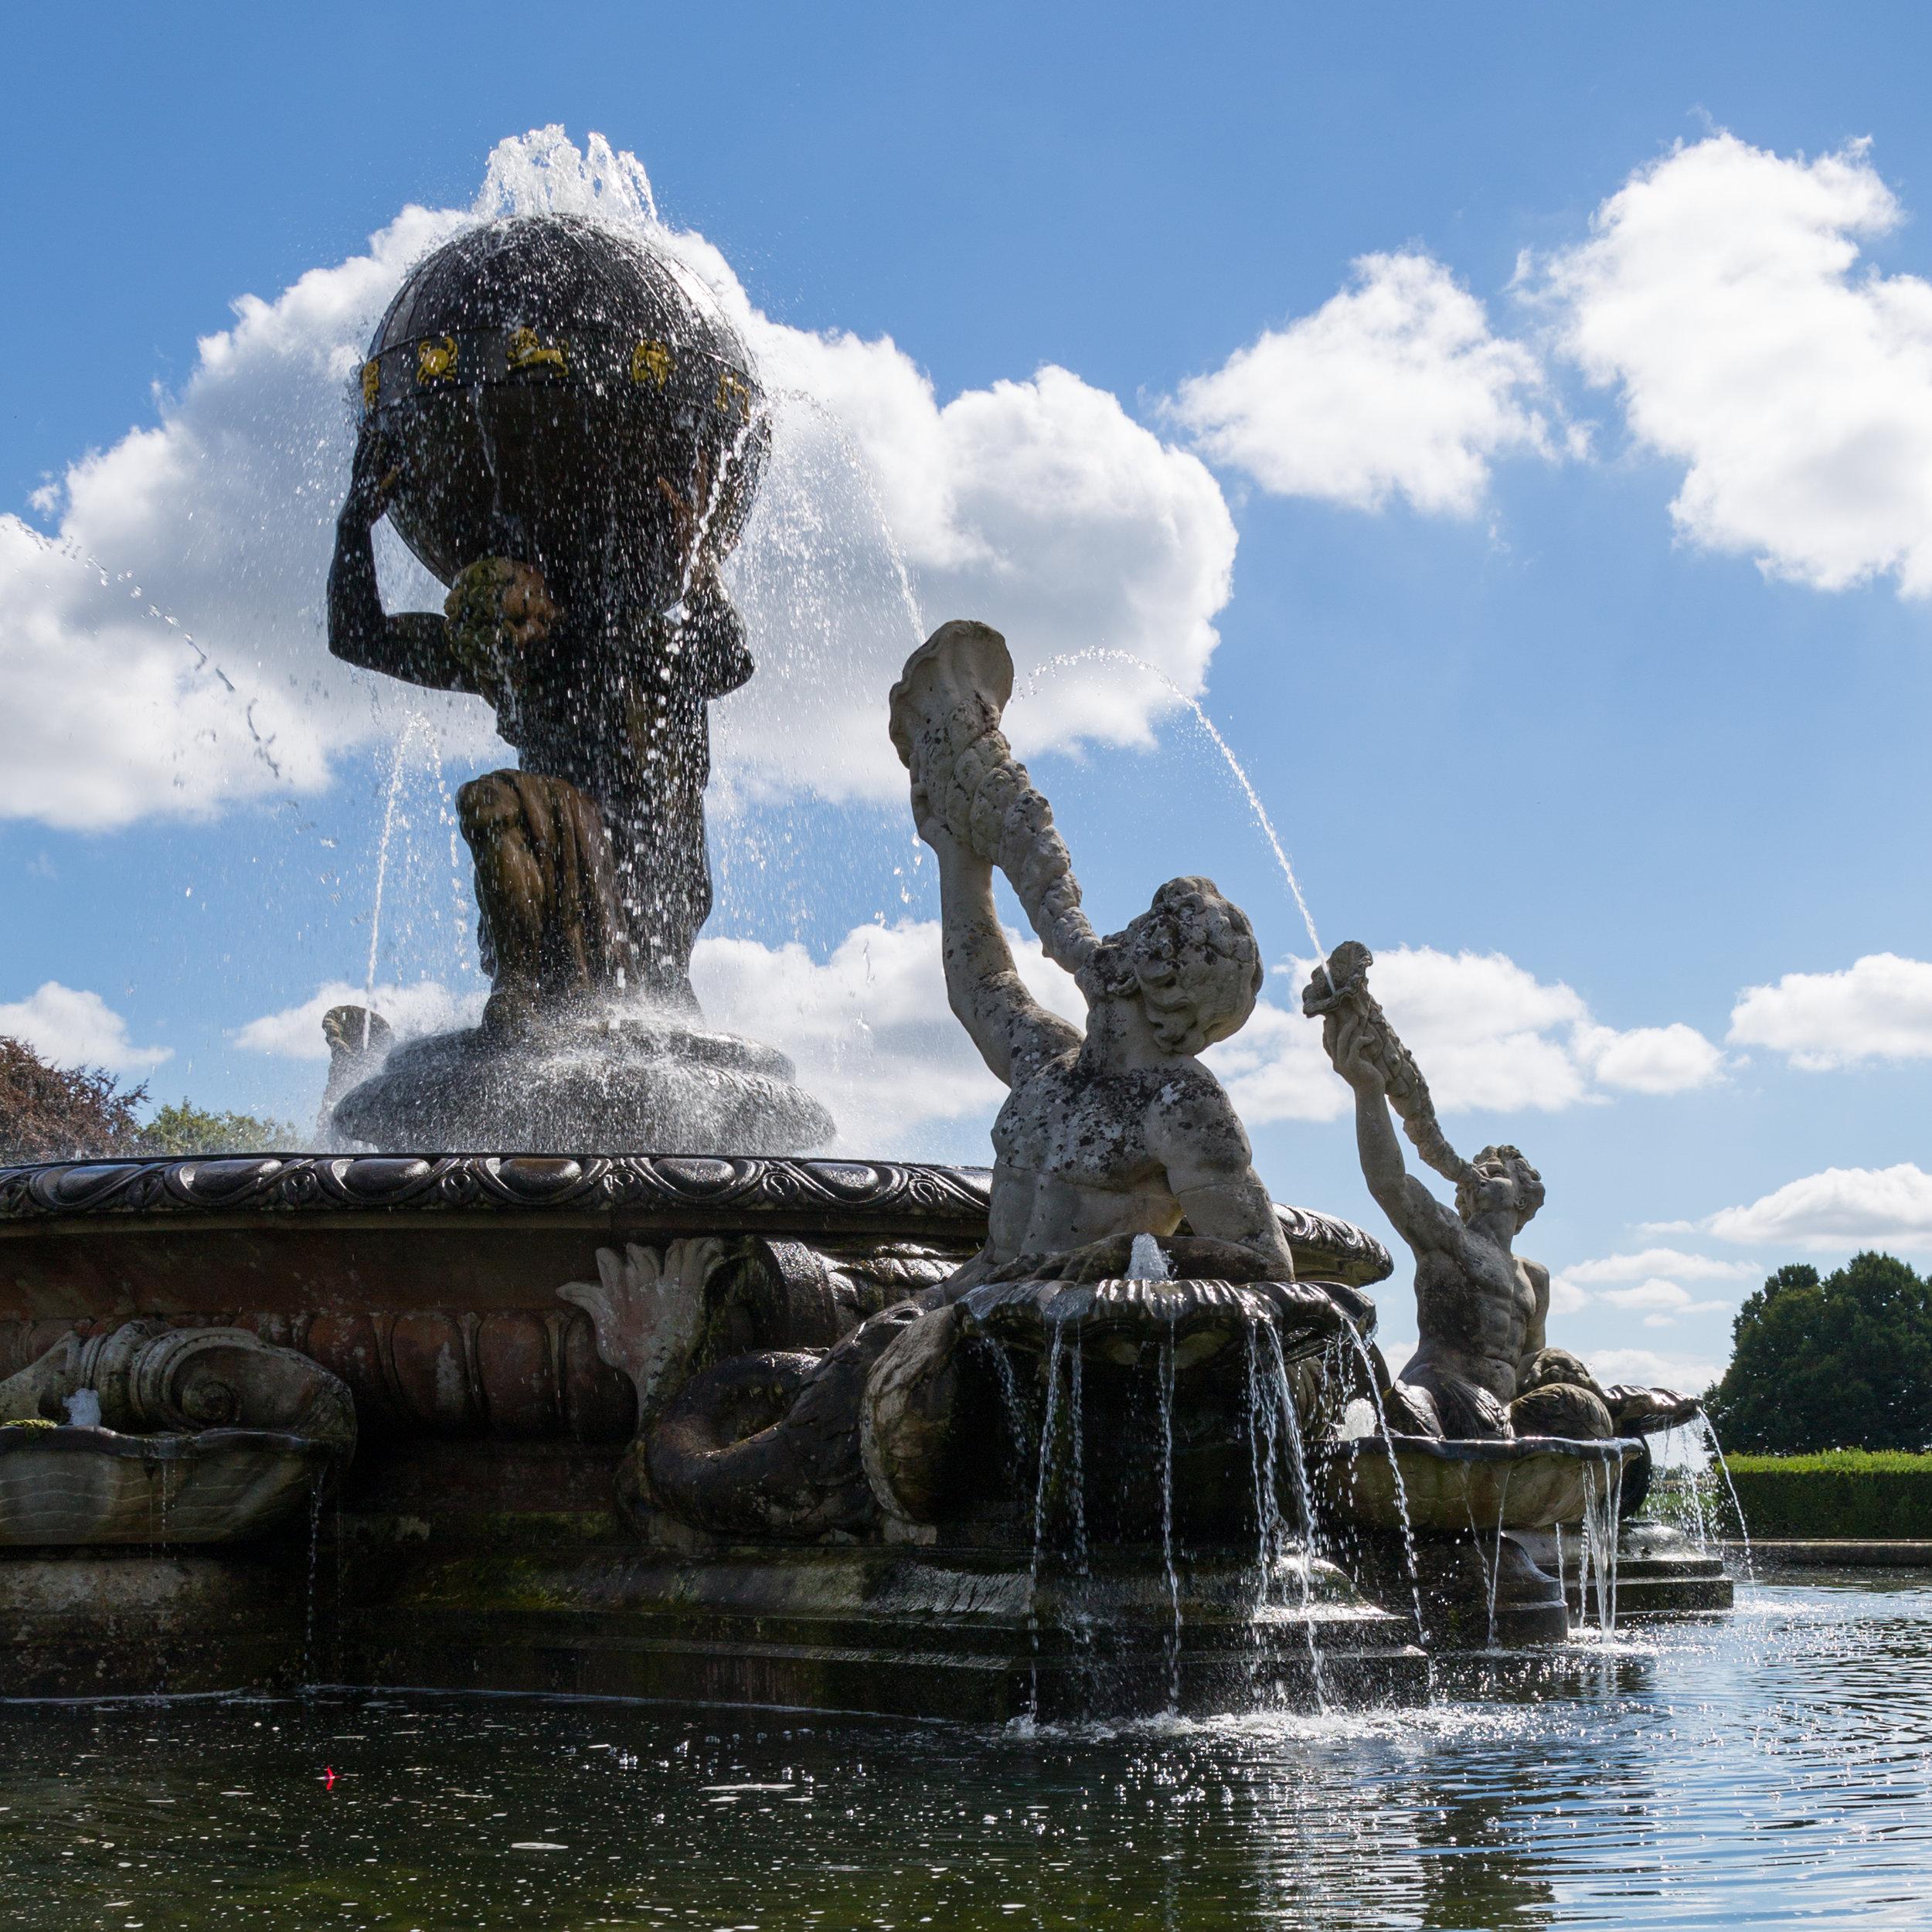 Tritons blowing water through shells at The Atlas Fountain,Castle Howard.  Image: Chris Denning/Verve Garden Design.